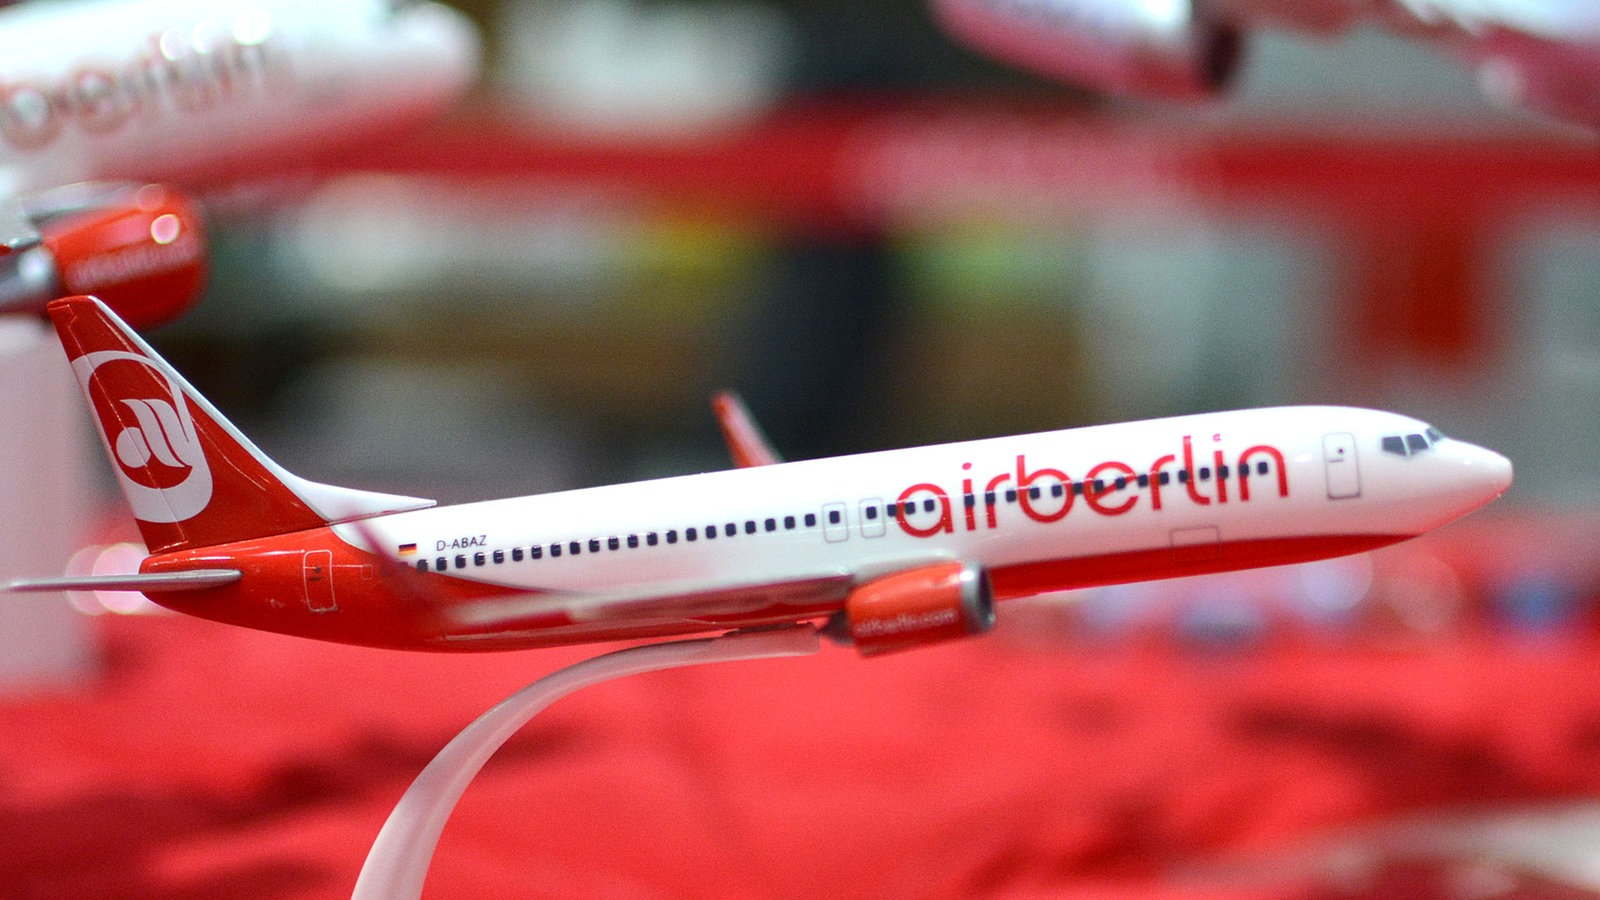 Air Berlin Wdr